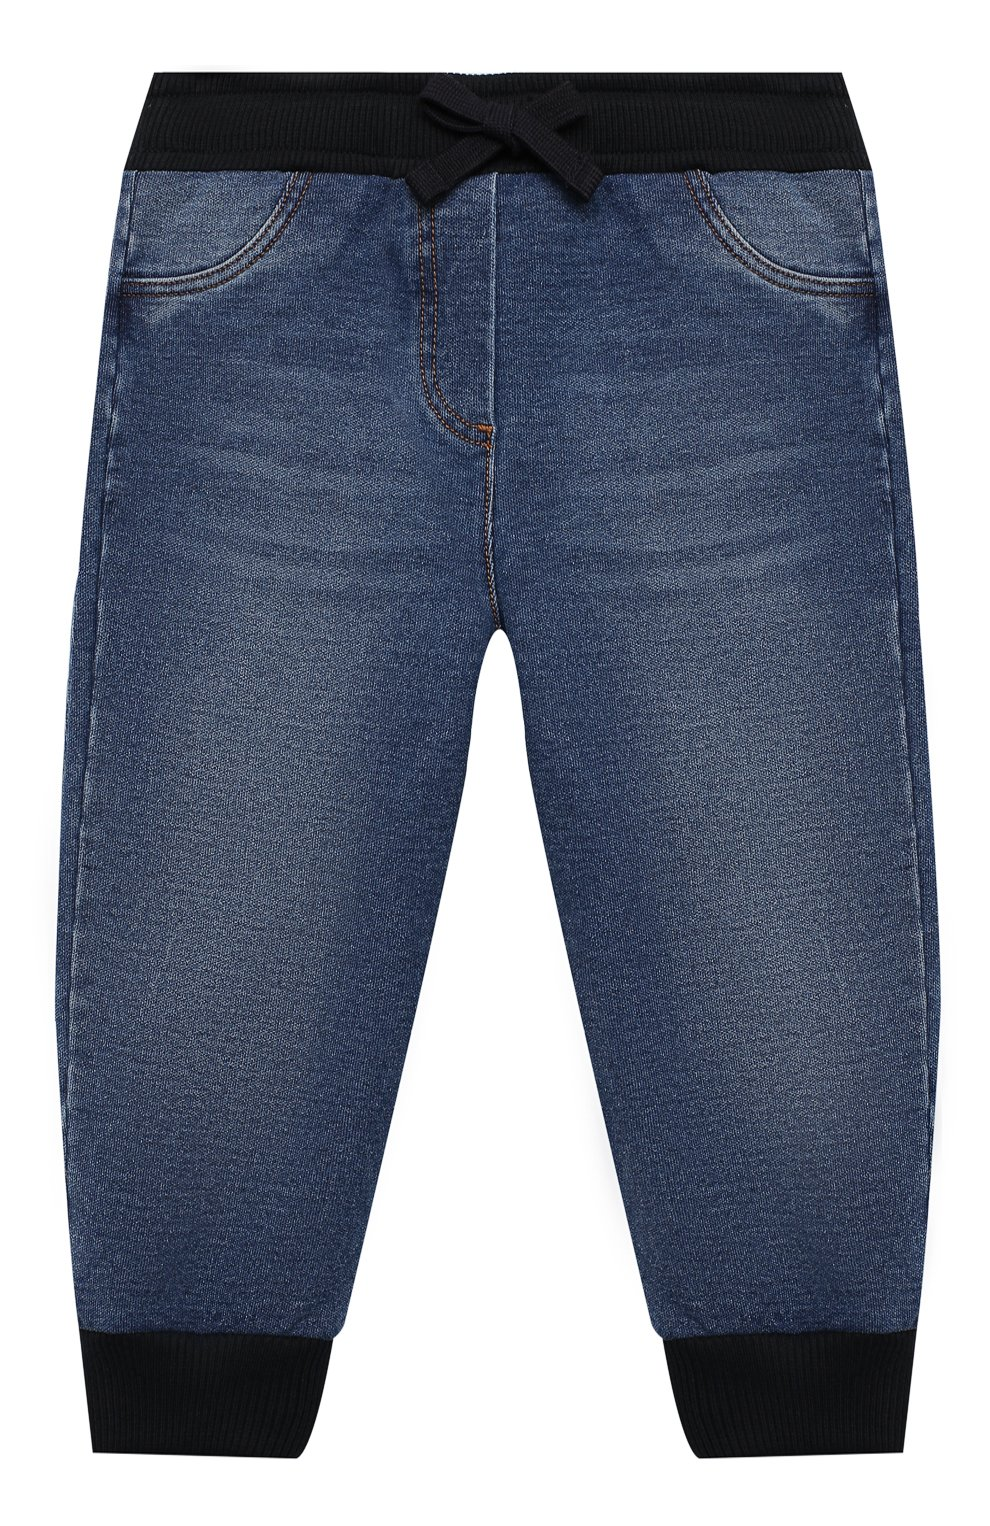 Детские джинсы DOLCE & GABBANA синего цвета, арт. L2JP7G/G7XNY   Фото 1